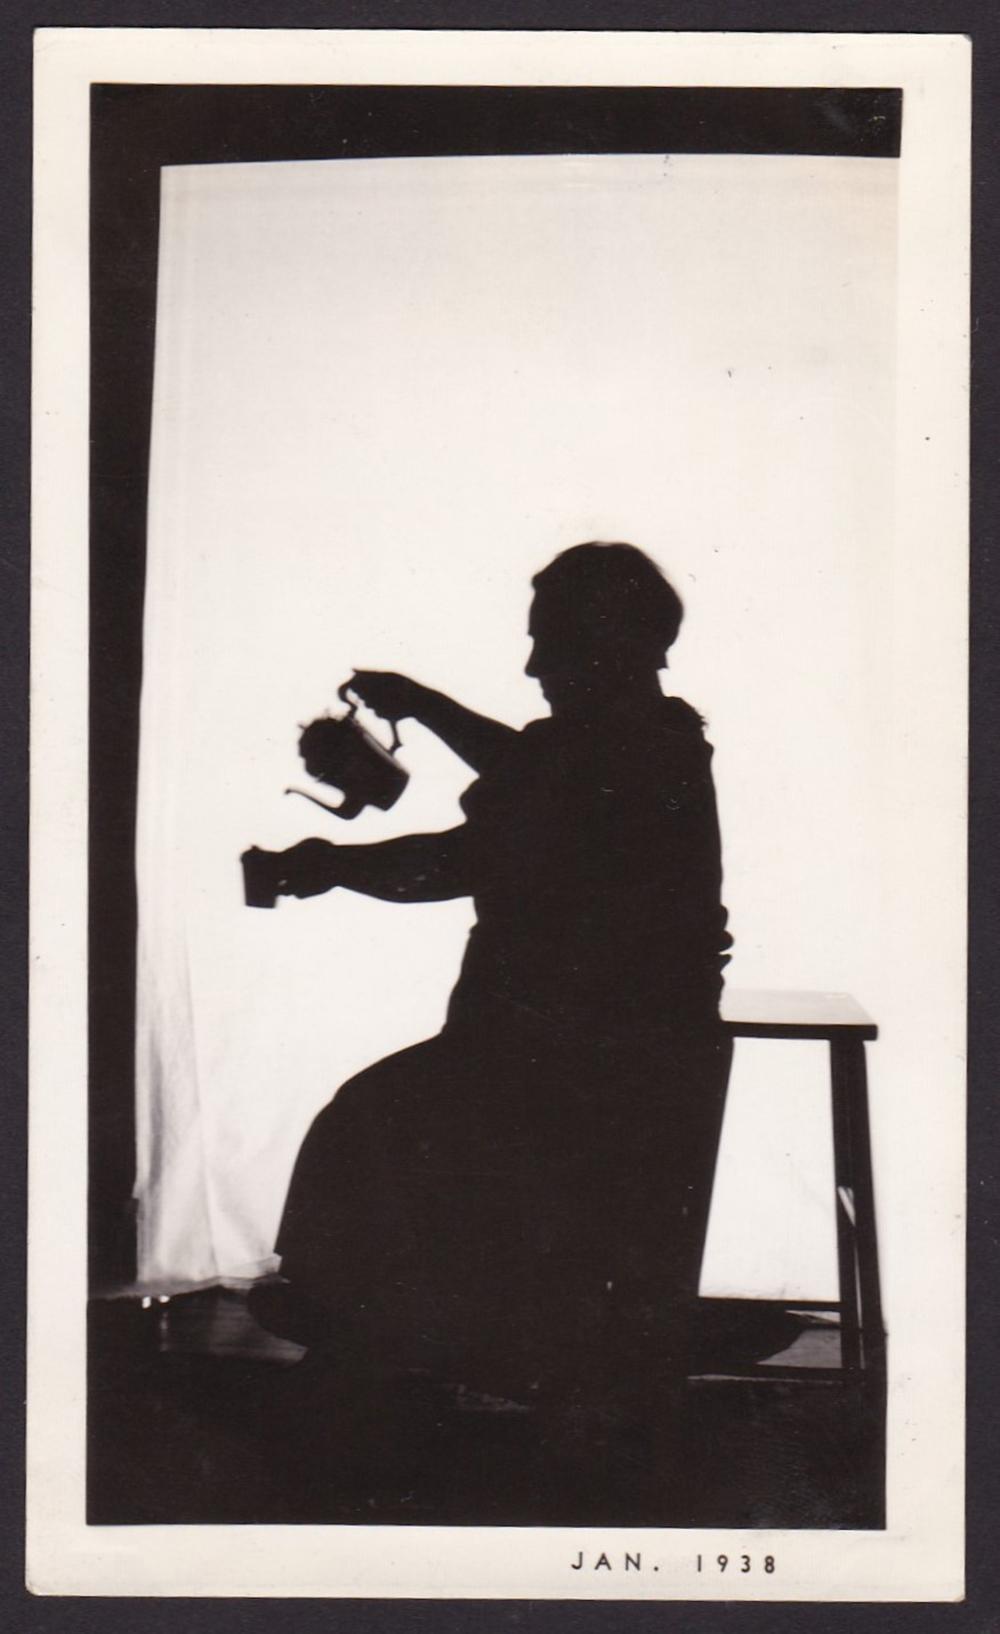 Silhouette photograph, 1938.